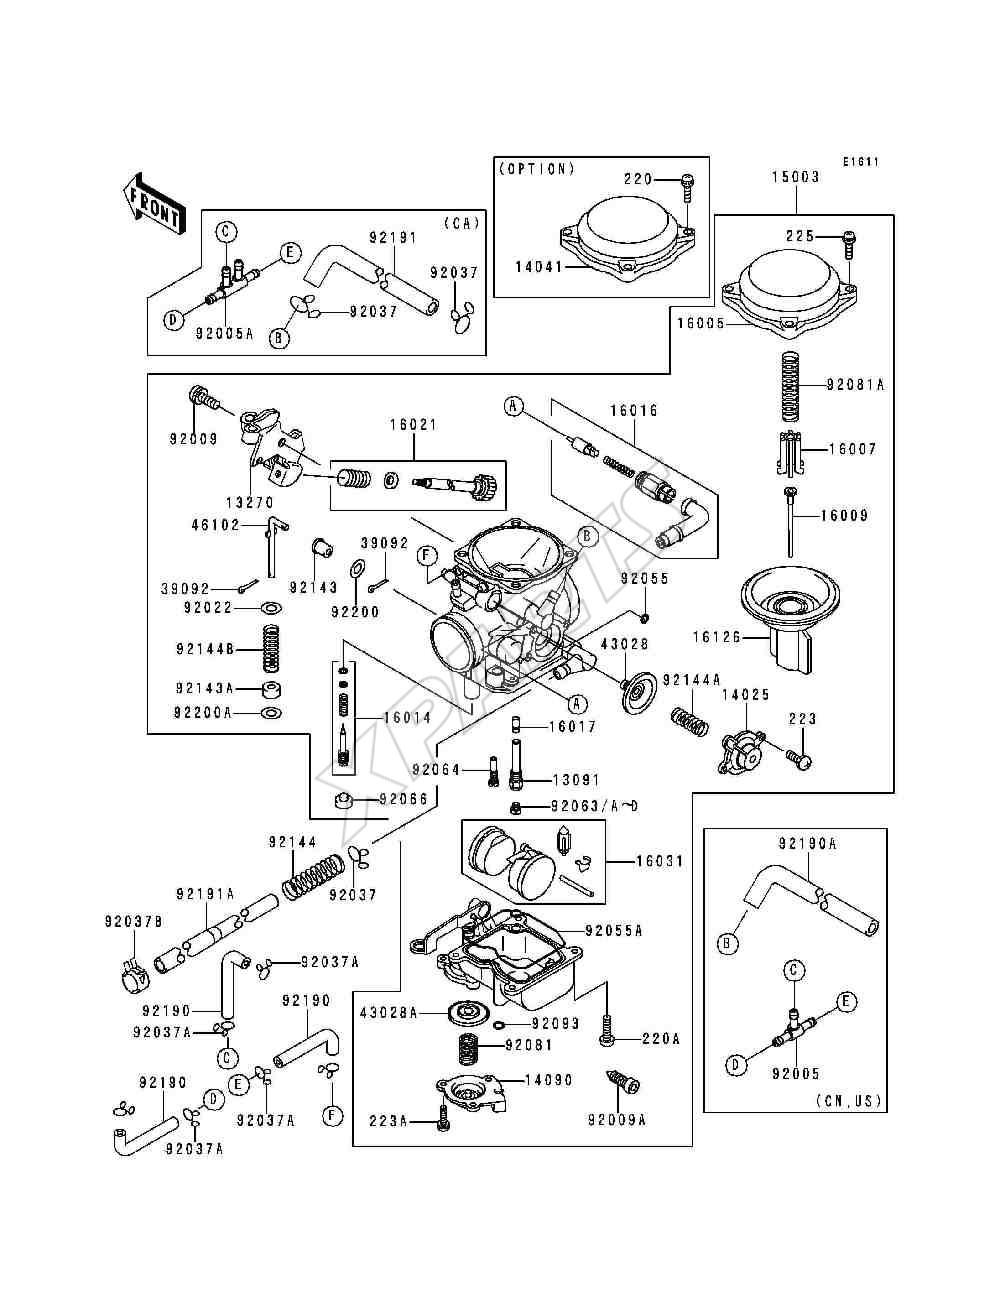 Keihin cvk34 carburetor diagram 2003 harley sportster wiring diagram at ww w justdeskto allpapers